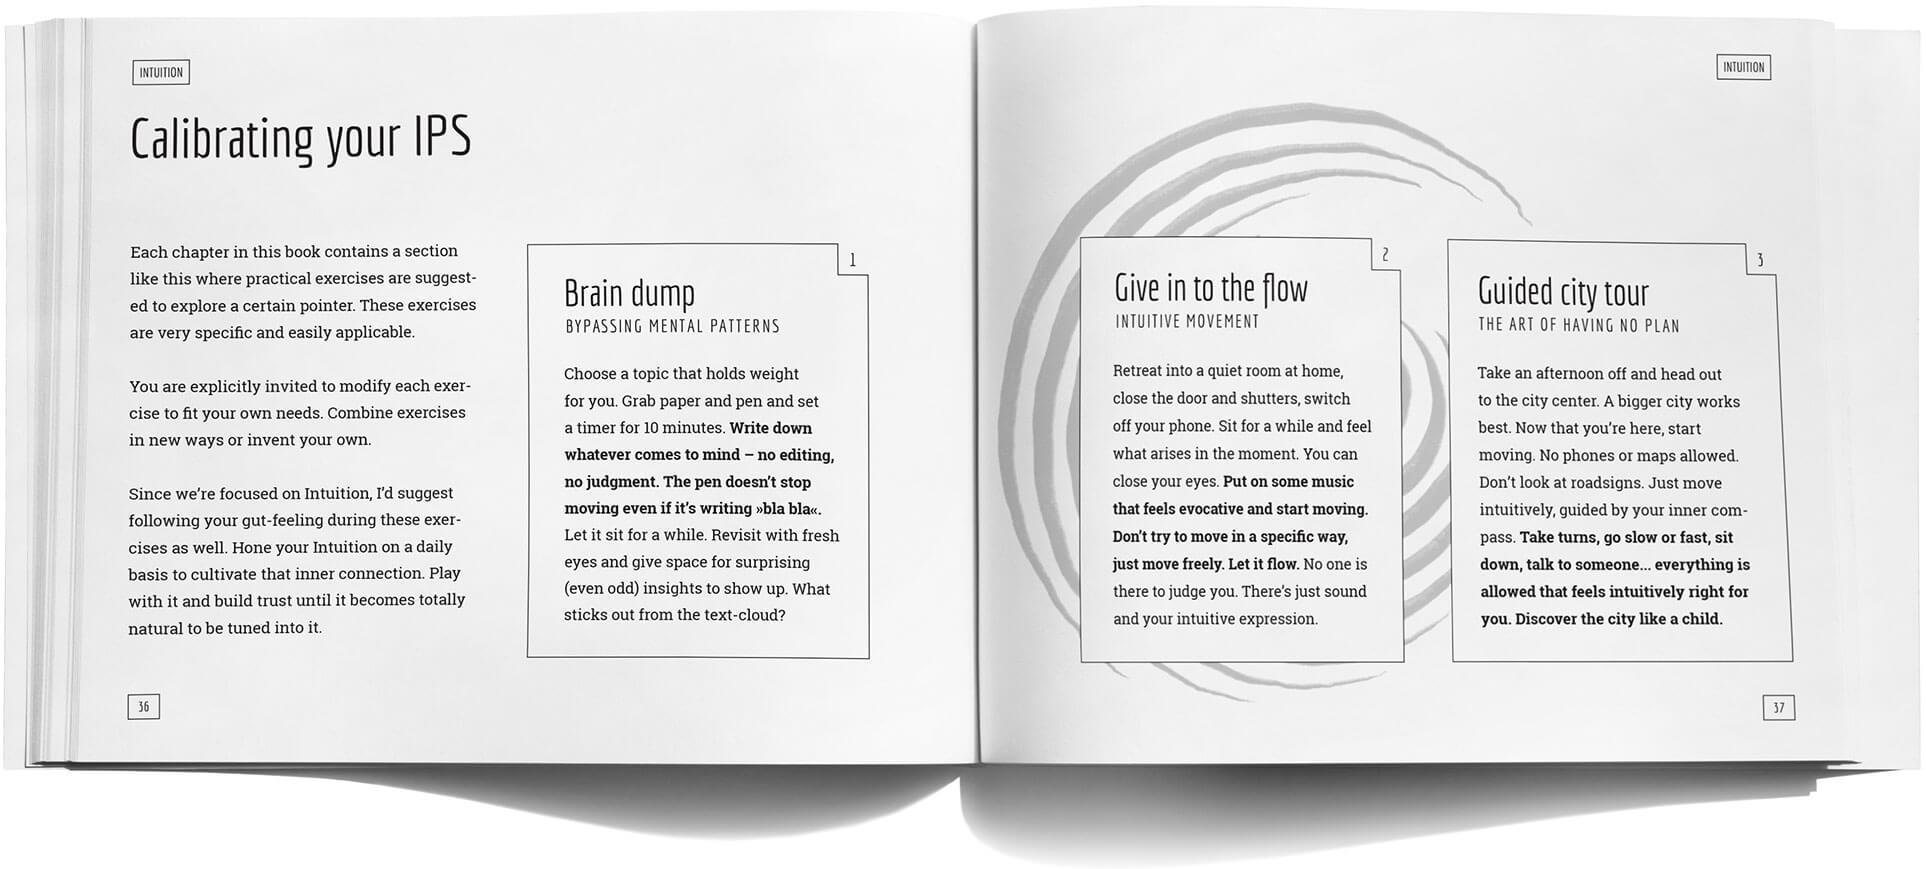 Applied Spirituality for Bullshit-Free Living Workbook - Excerpt 1 - Mathias Fritzen